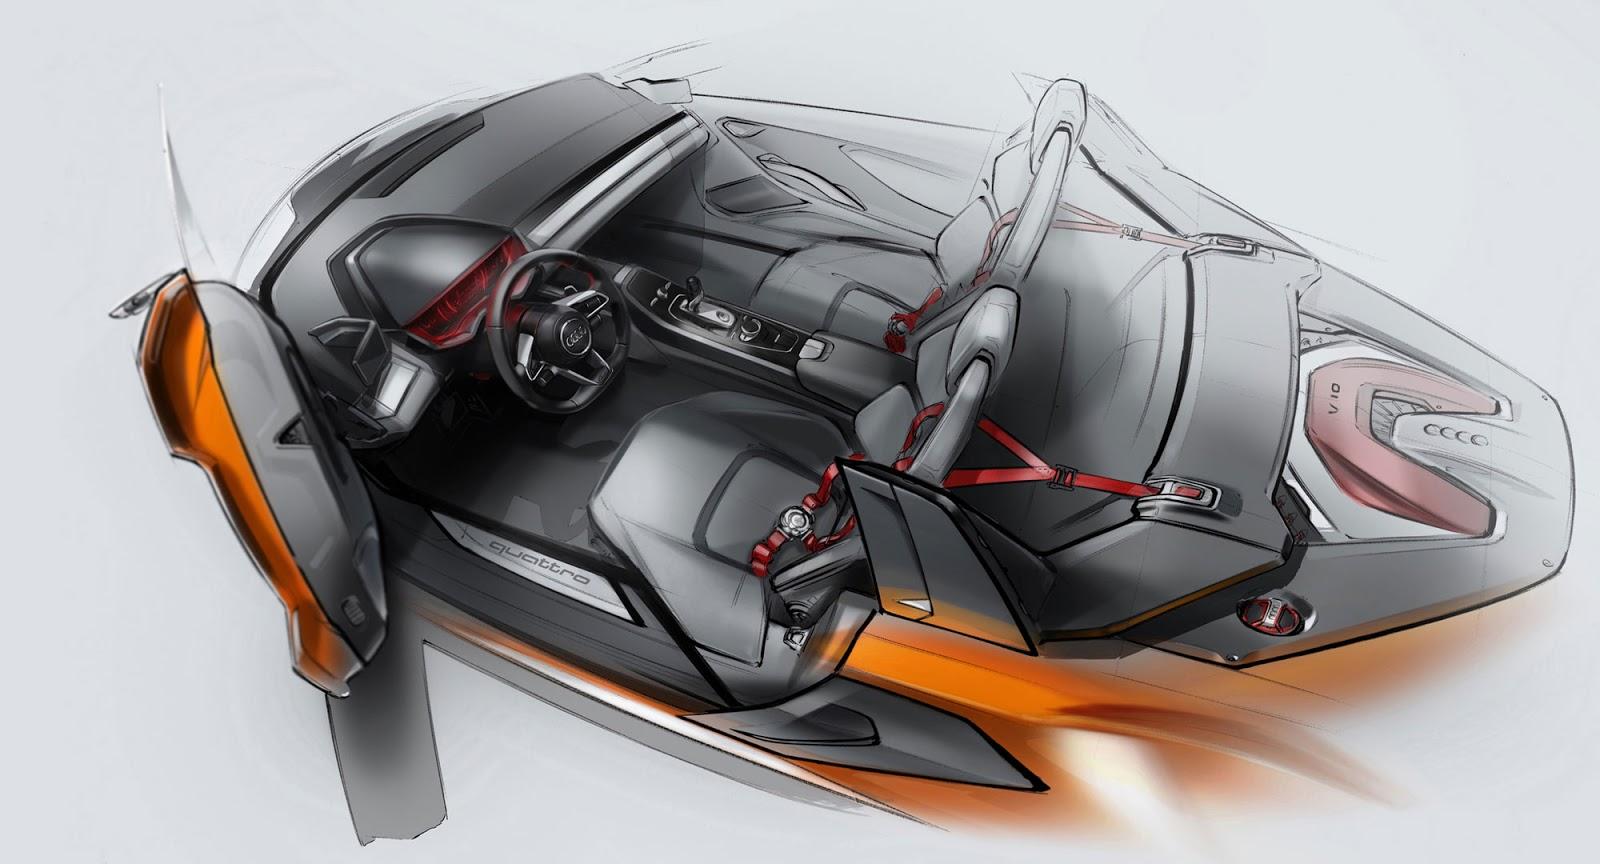 Audi Nanuk concept sketch